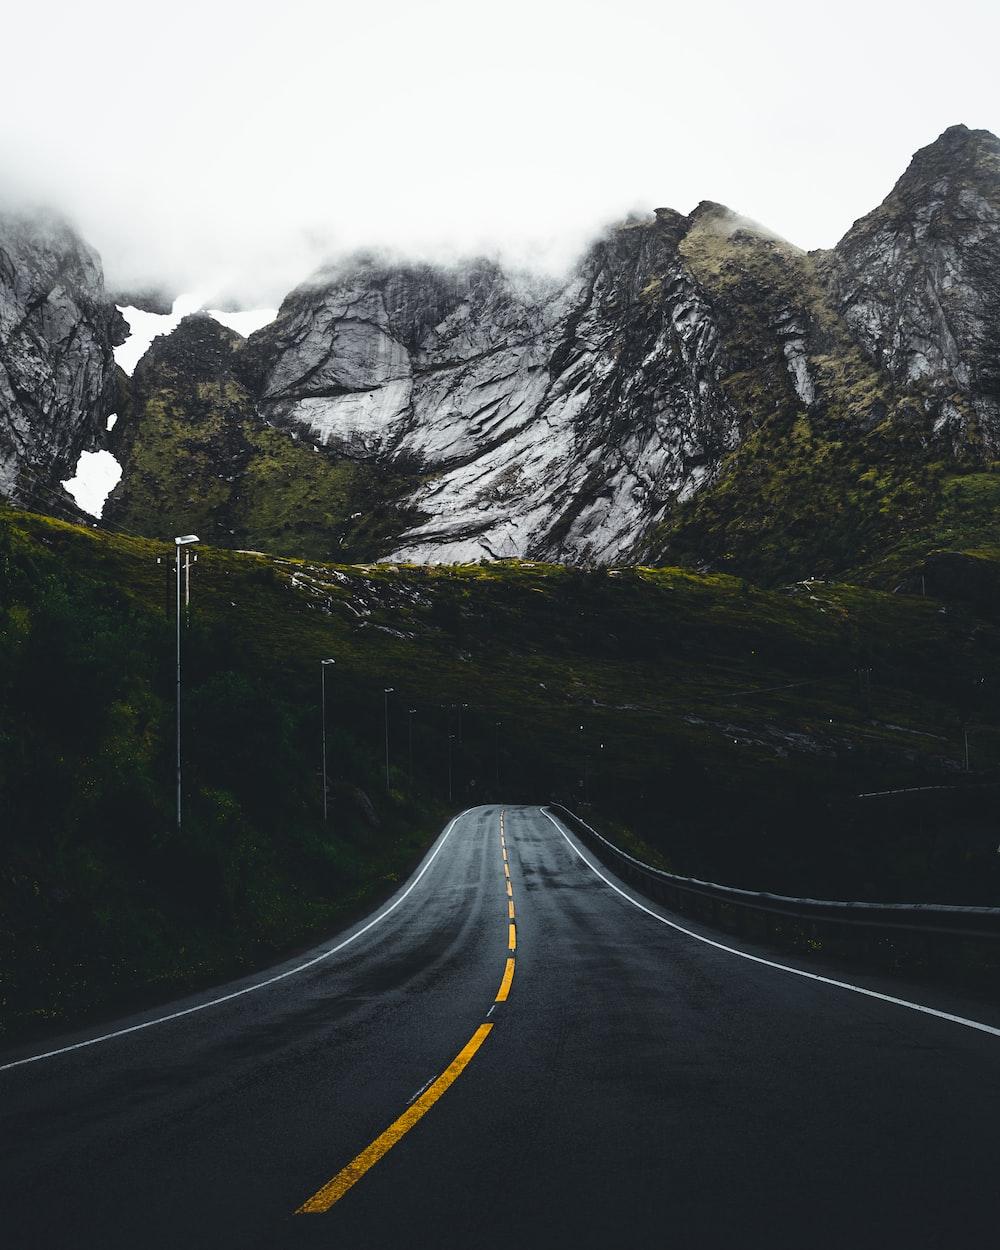 a mountain road photo by taneli lahtinen tanelah on unsplash